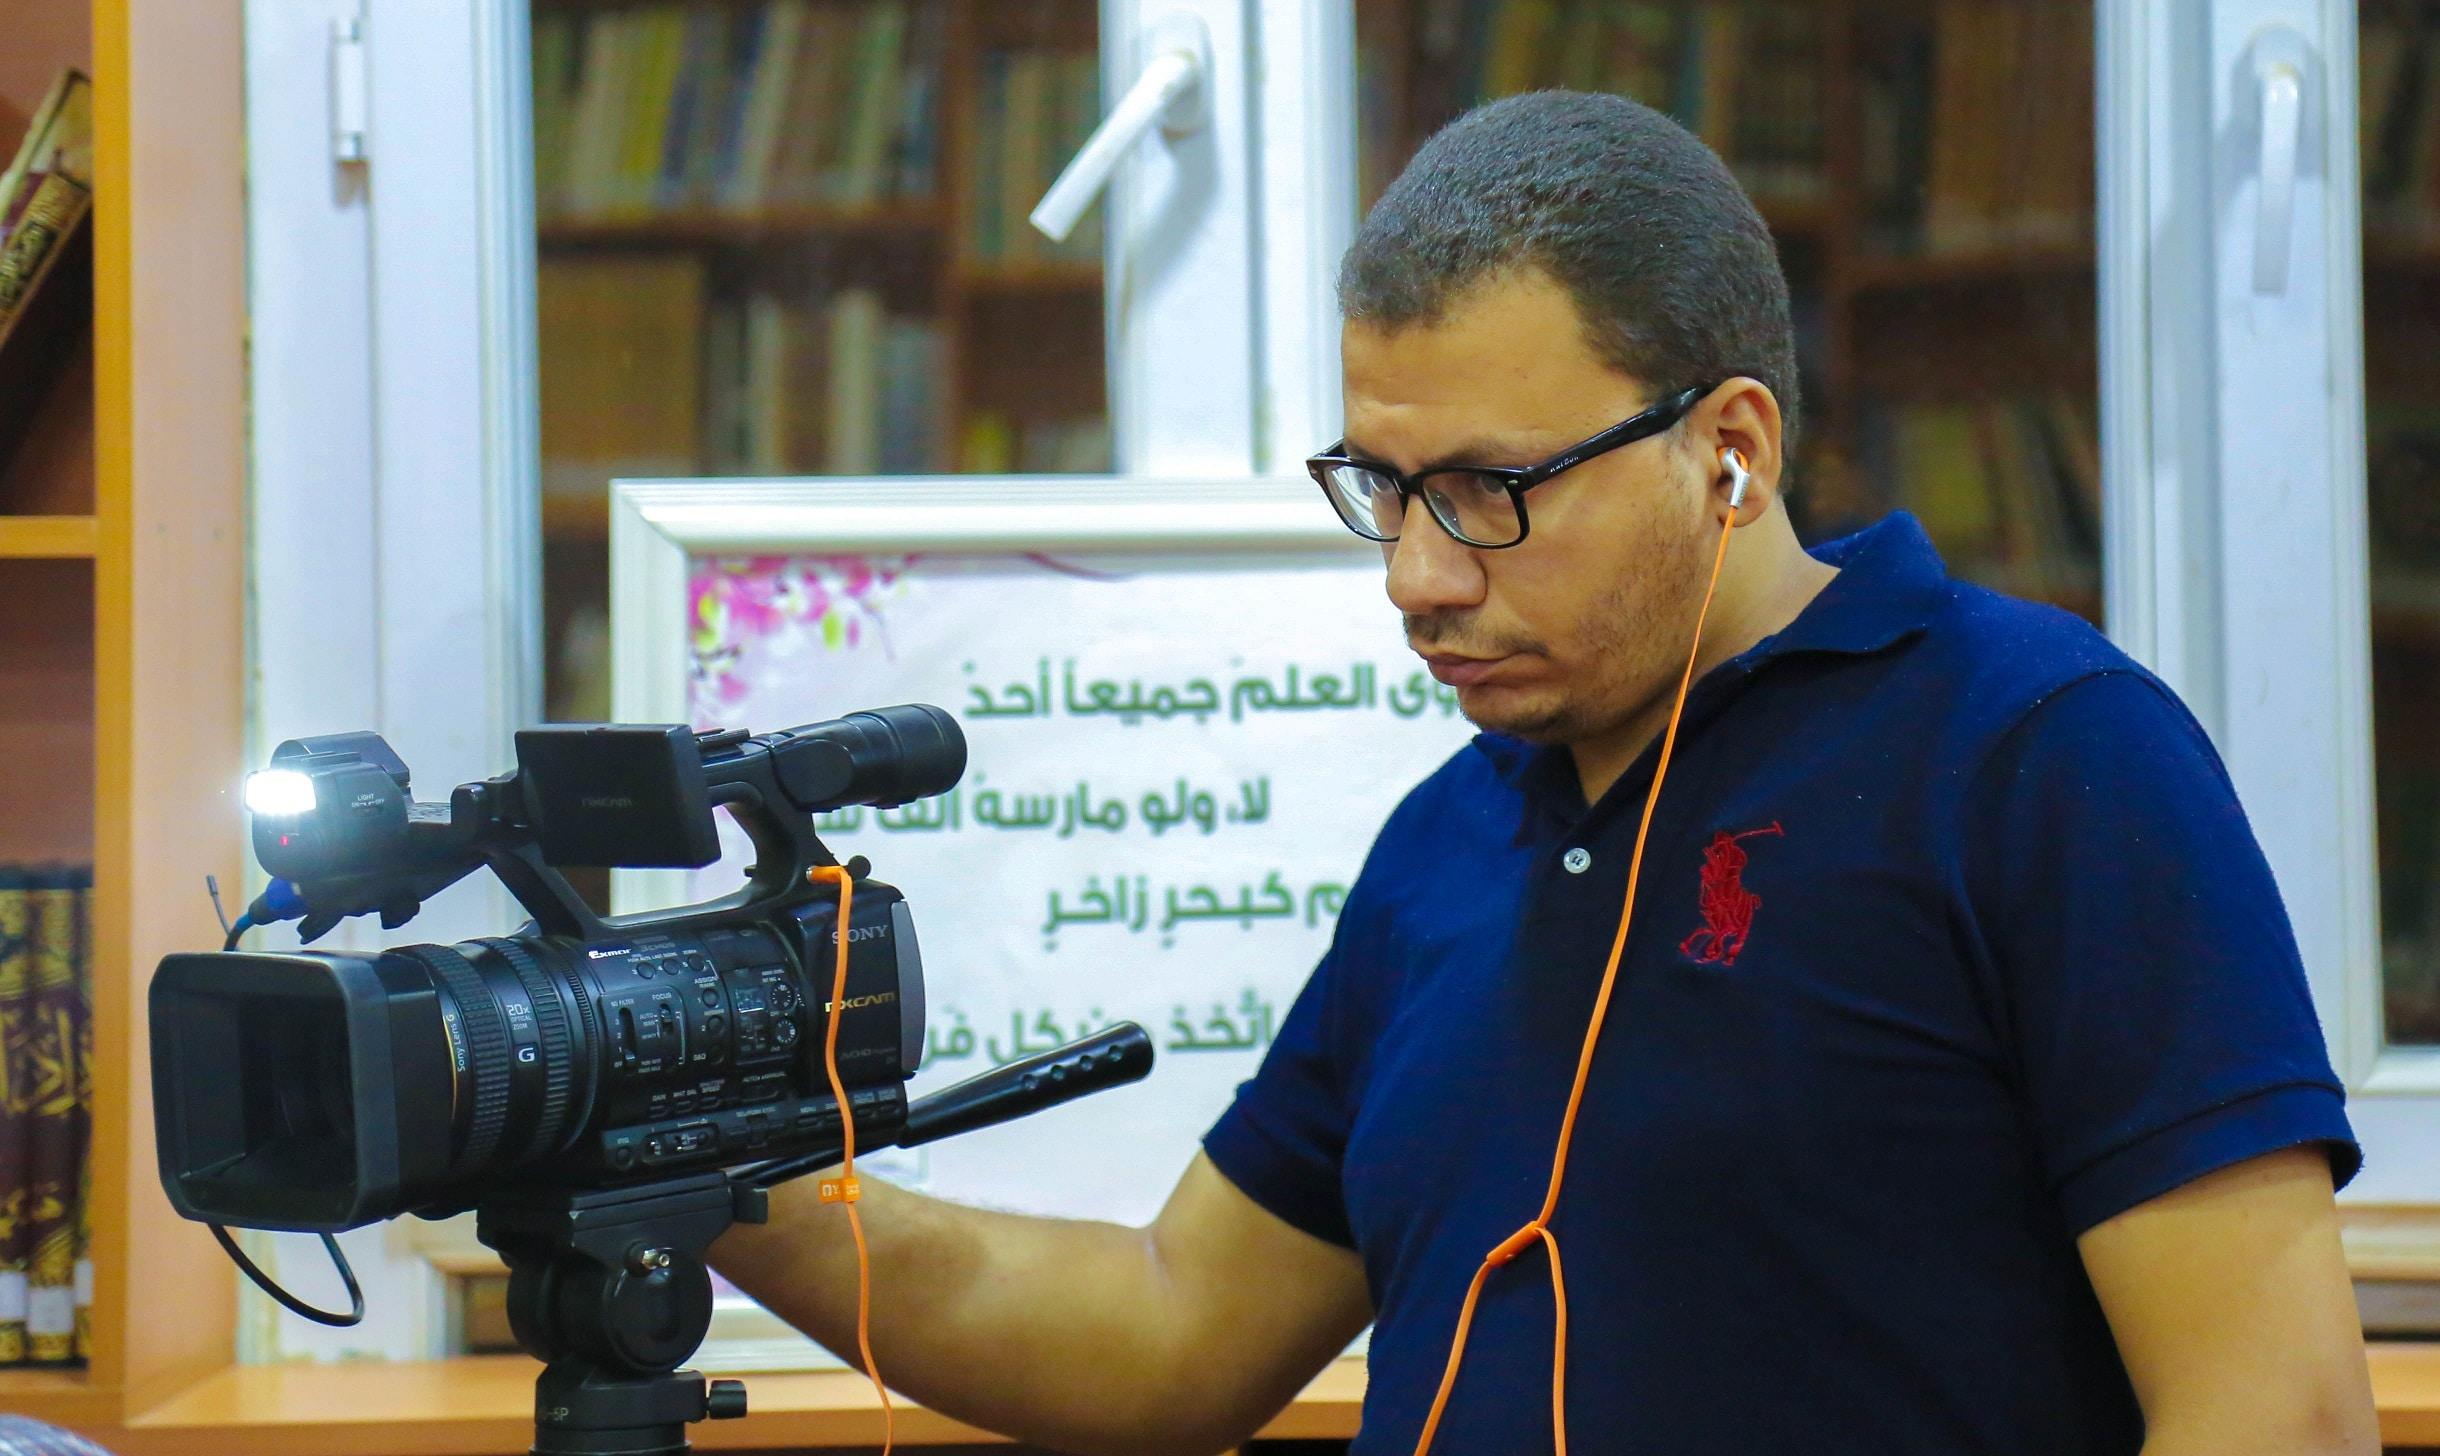 Go to ibrahim abdullah's profile